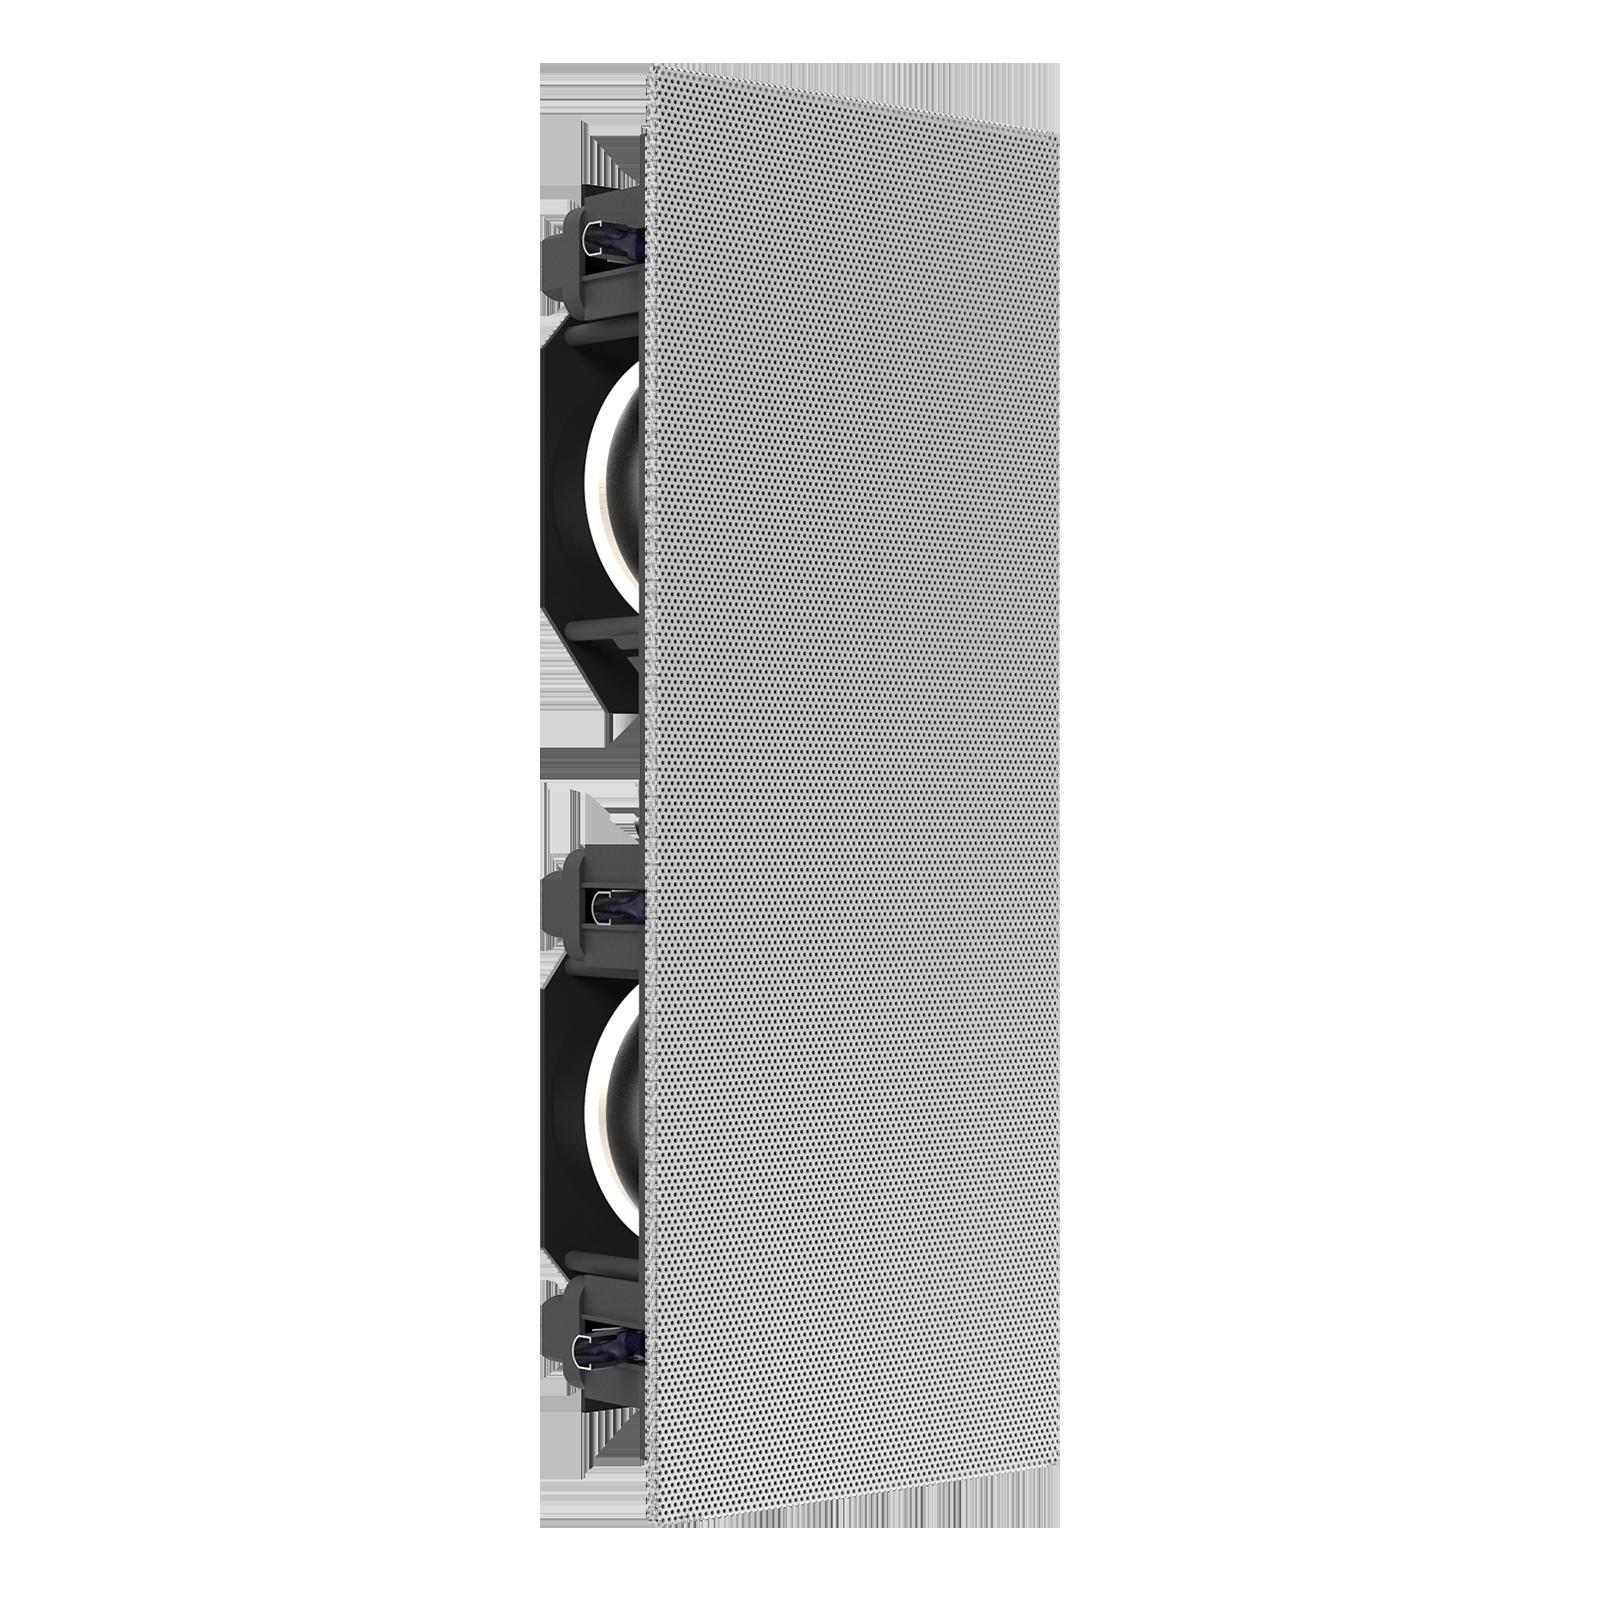 SCL-7 - Black - 2-Way Dual 5.25-inch (130mm) In-Wall Loudspeaker - Detailshot 3